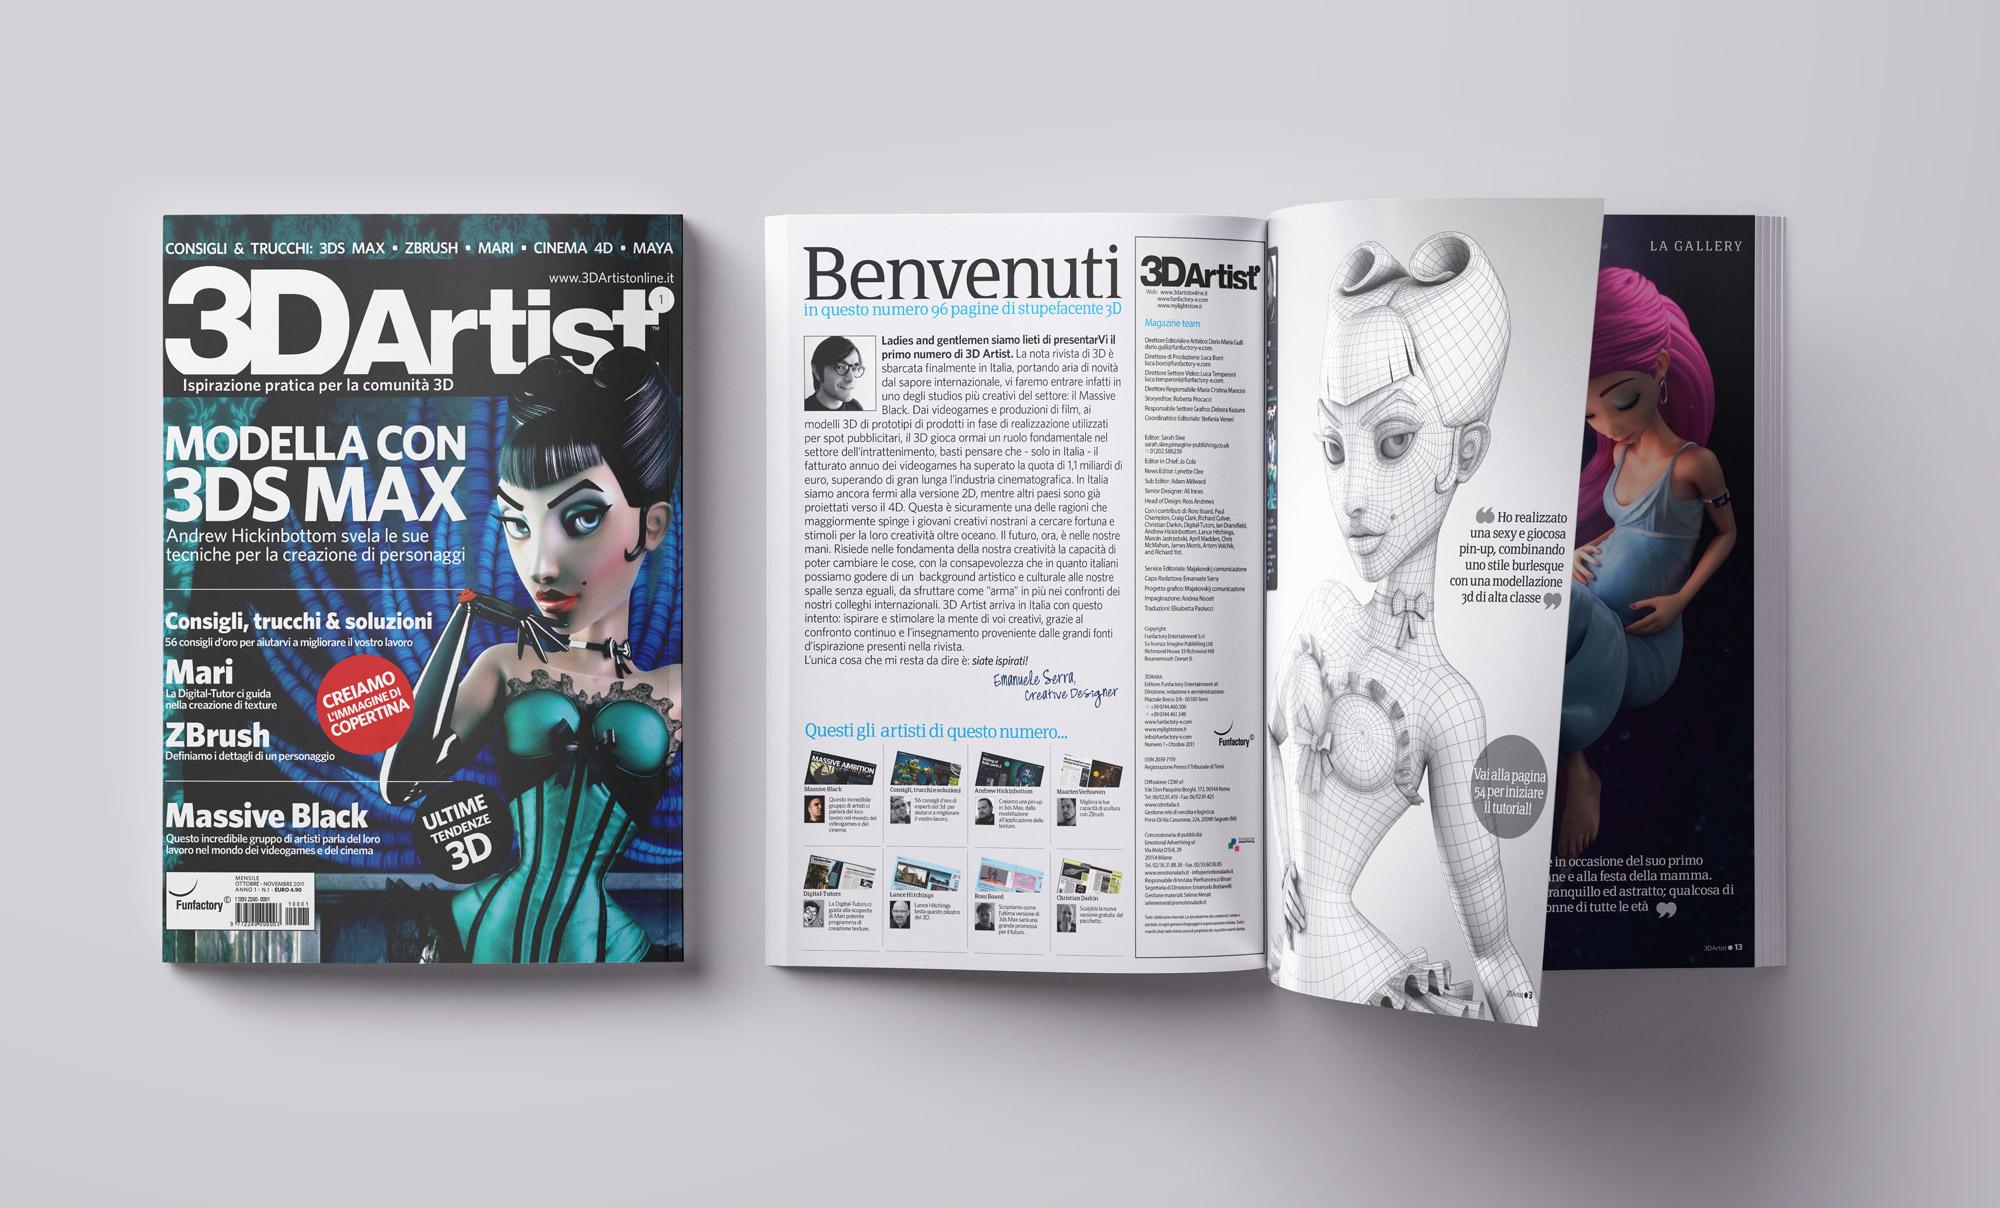 3DArtist-Magazine-Emanuele-Serra